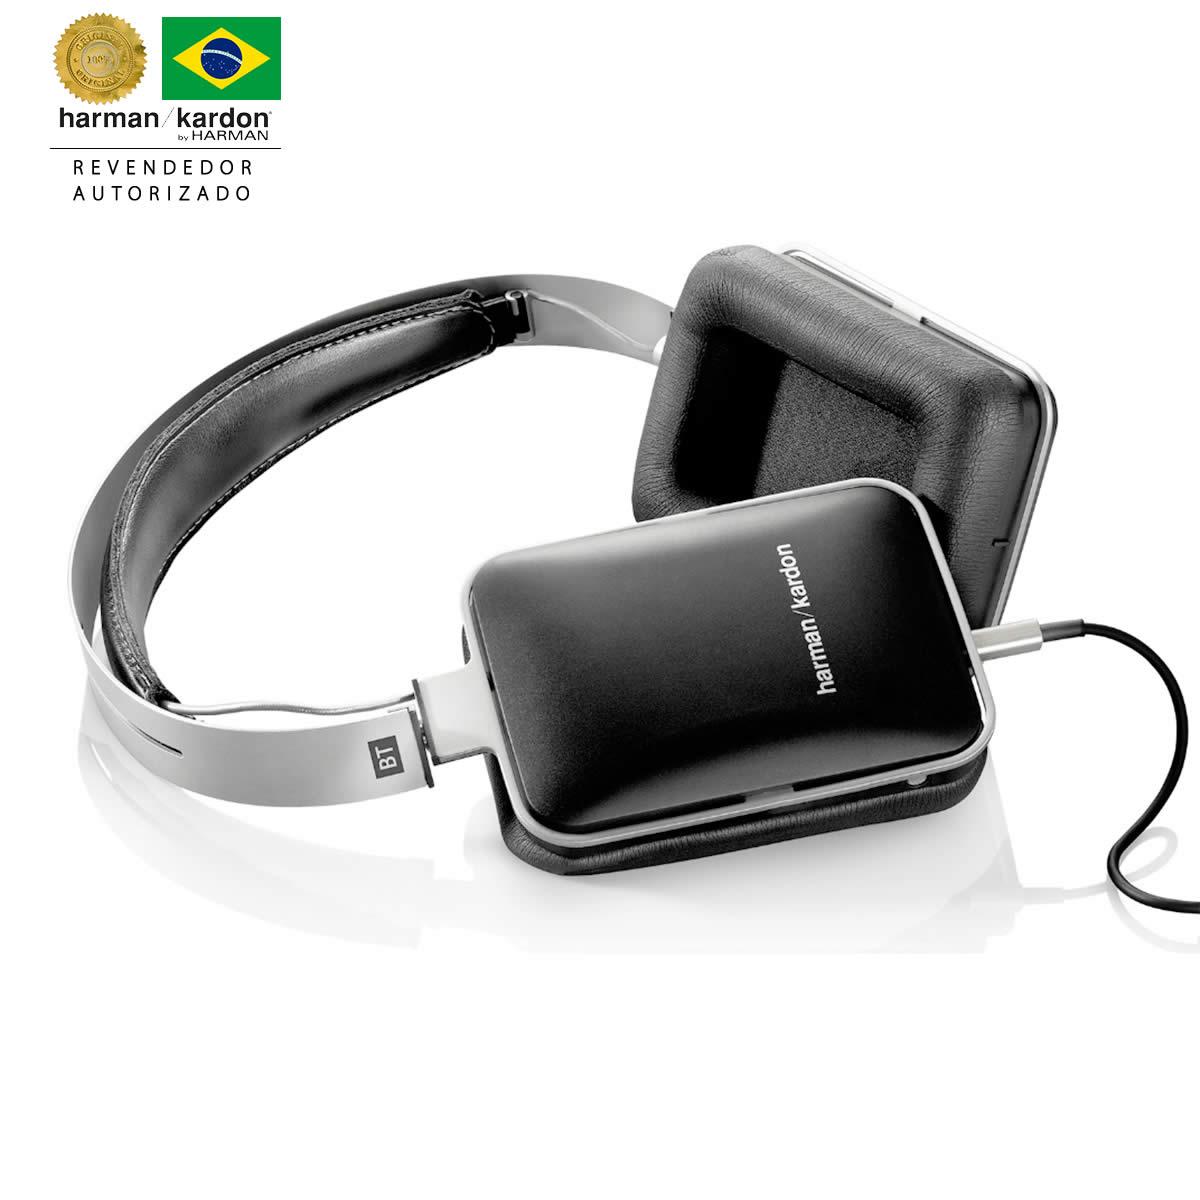 HAR/KARBT - Fone de Ouvido On-ear c/ Bluetooth HAR / KAR BT - Kardon